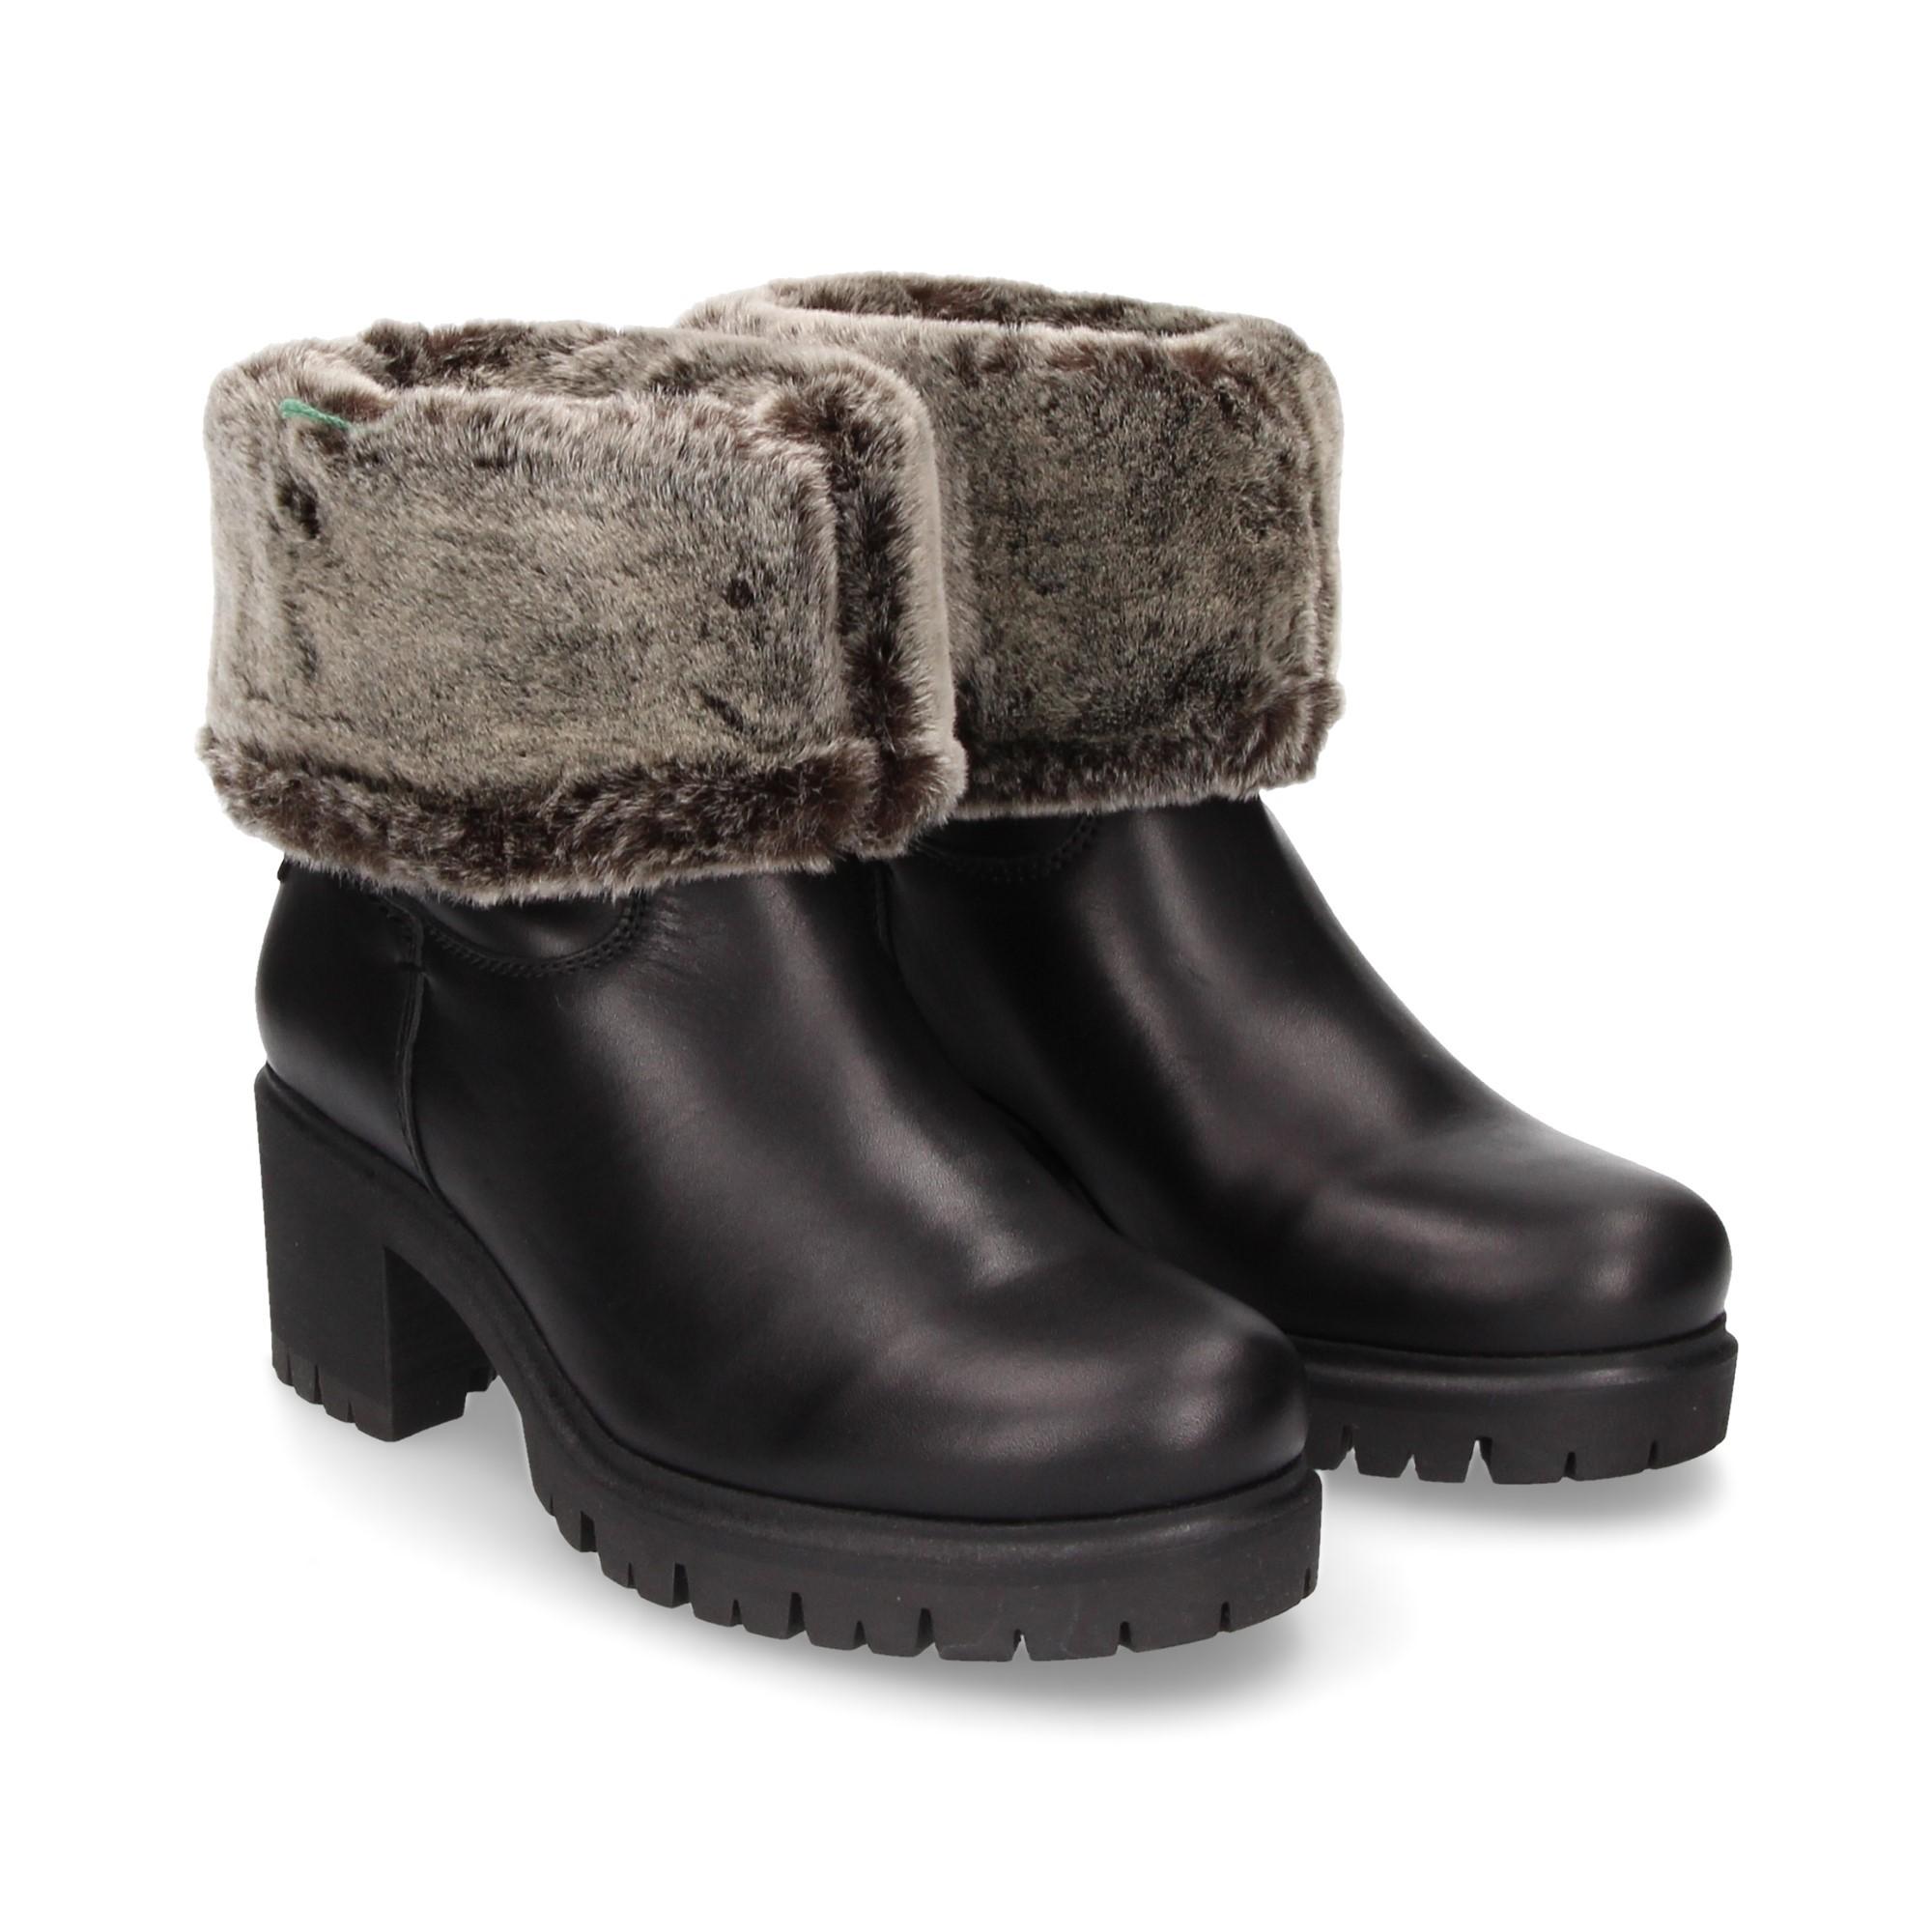 12681e3dc72782 PANAMA JACK Ankle boots mit Absatz für damen PIOLA B14 NEGRO